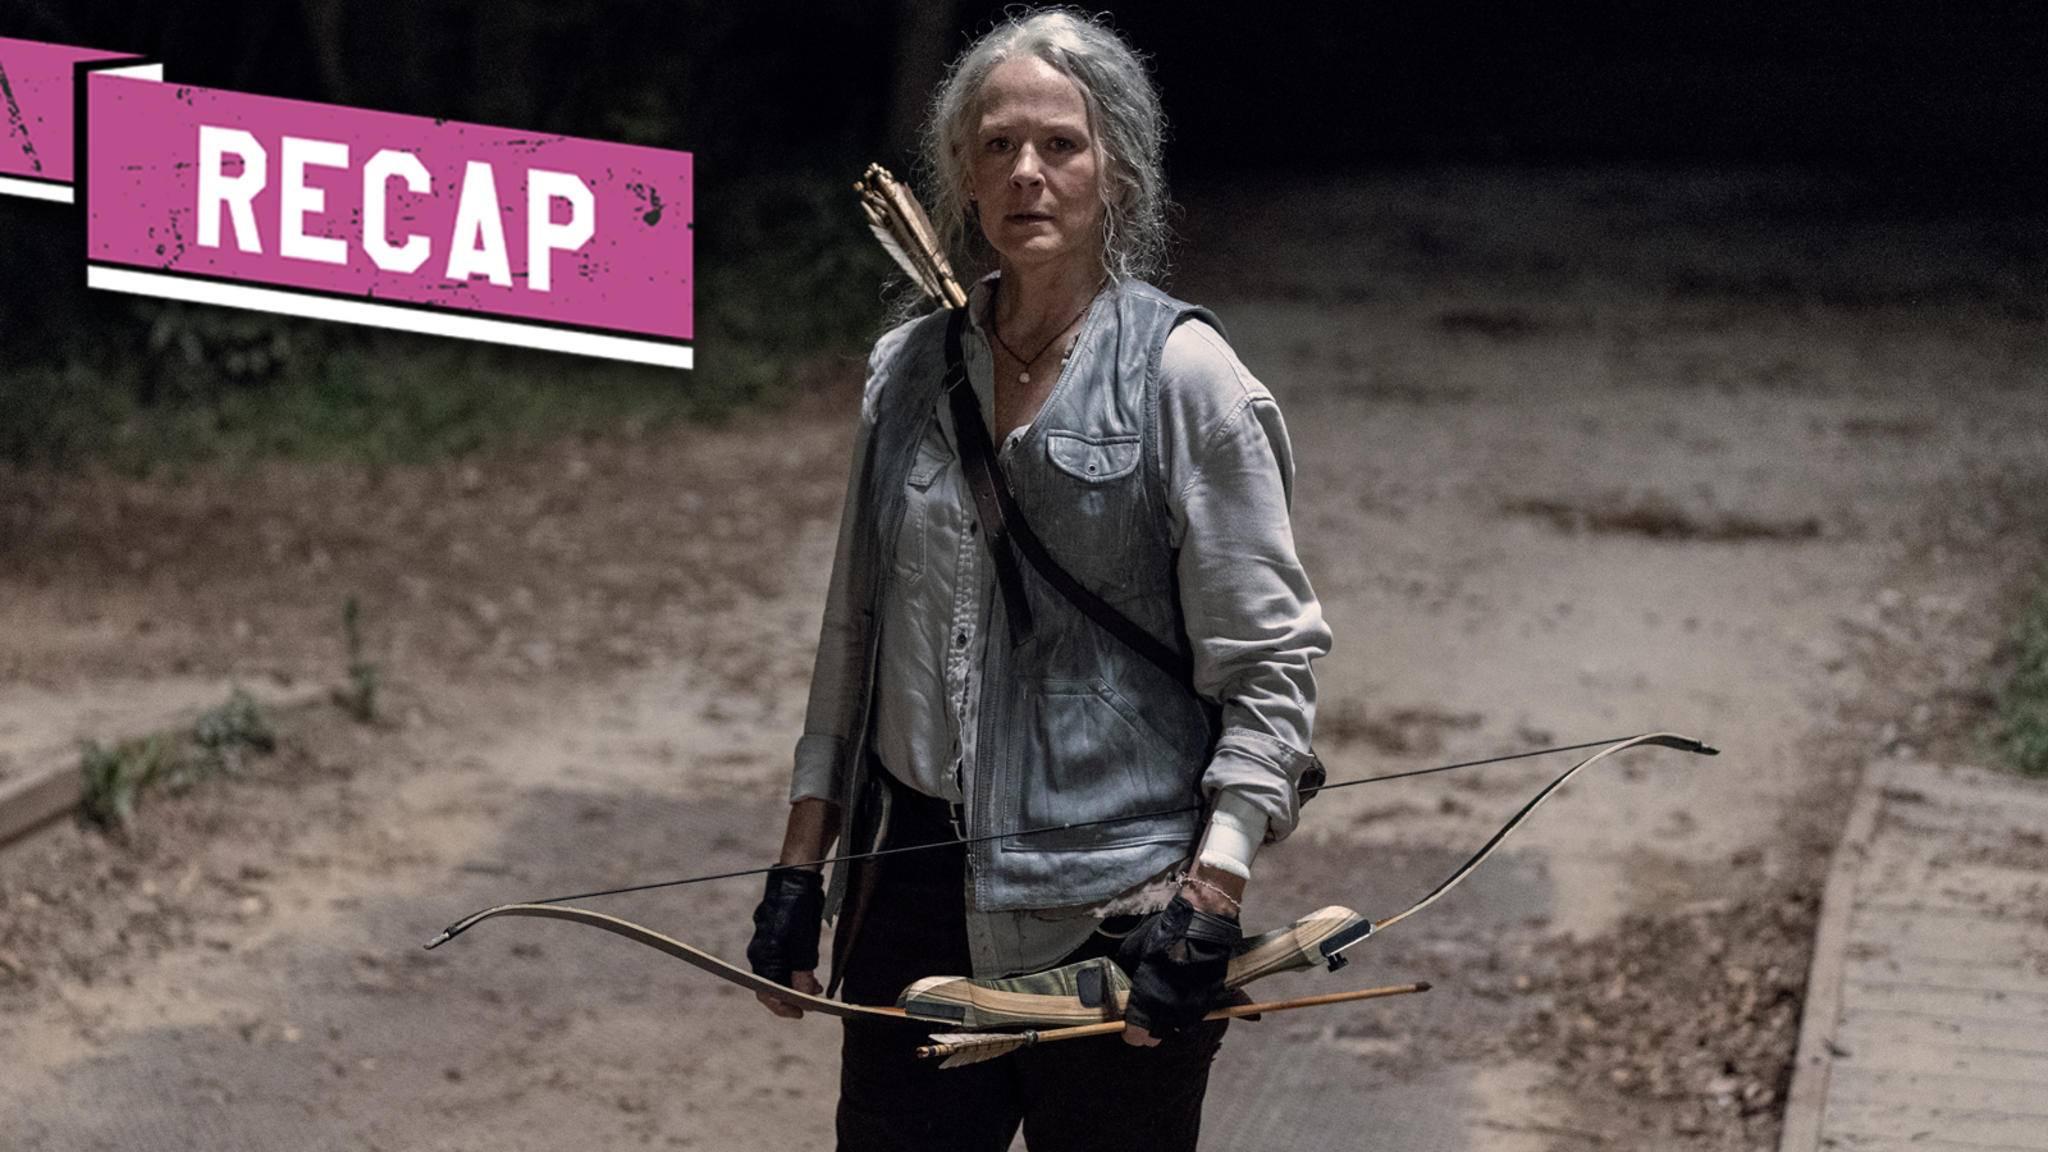 The Walking Dead-S10E07-Carol-Jace Downs-AMC-Teaserbild